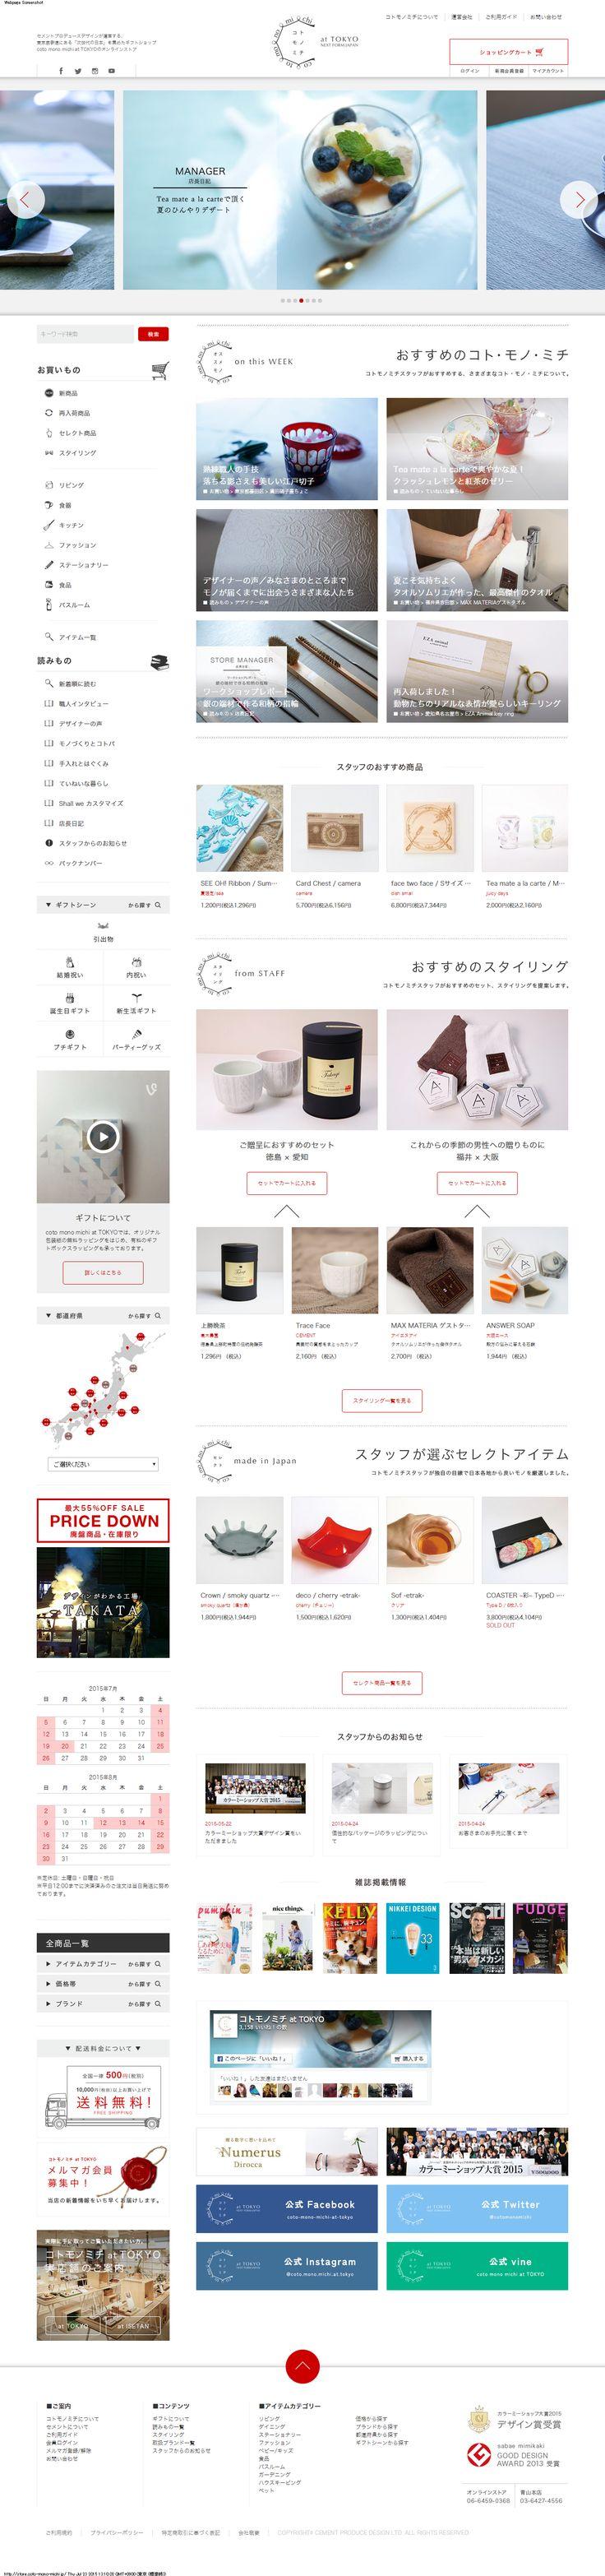 Webpage Screenshot - オンラインストア コトモノミチ at TOKYO